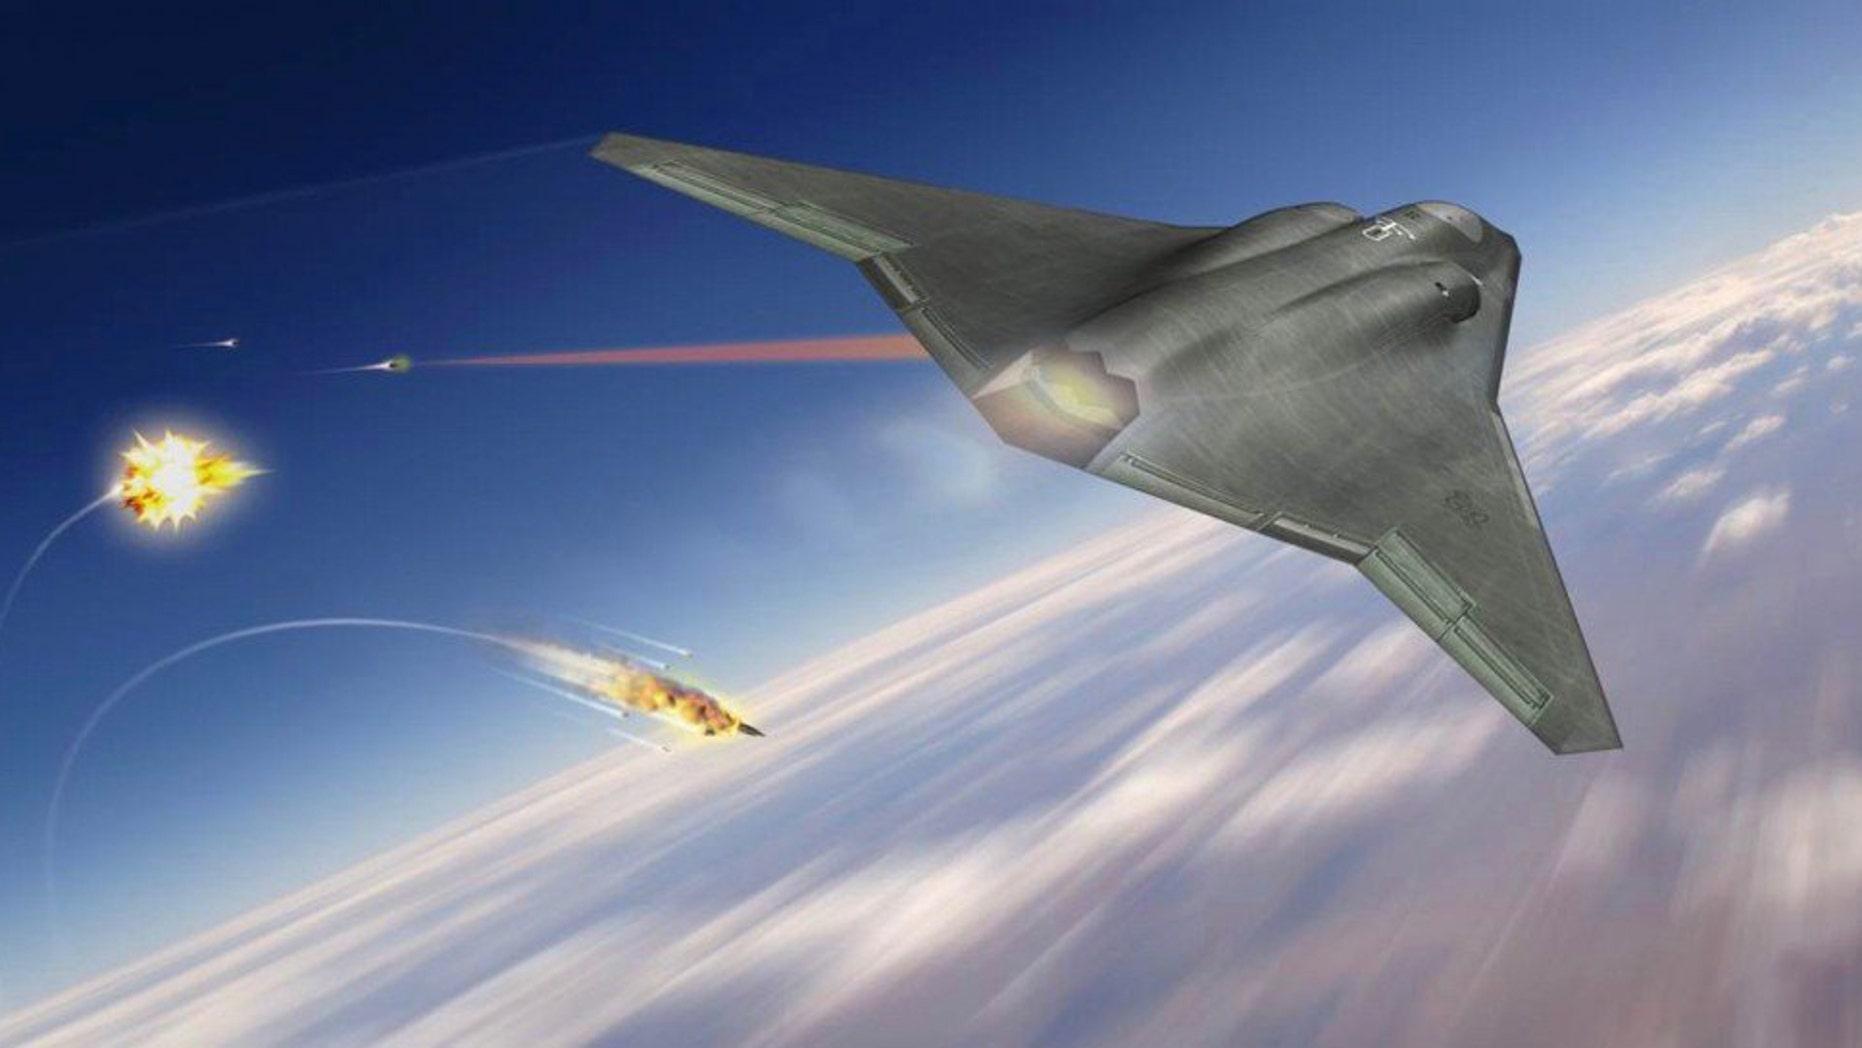 Artist's concept of NG Air Dominance (Northrop Grumman).